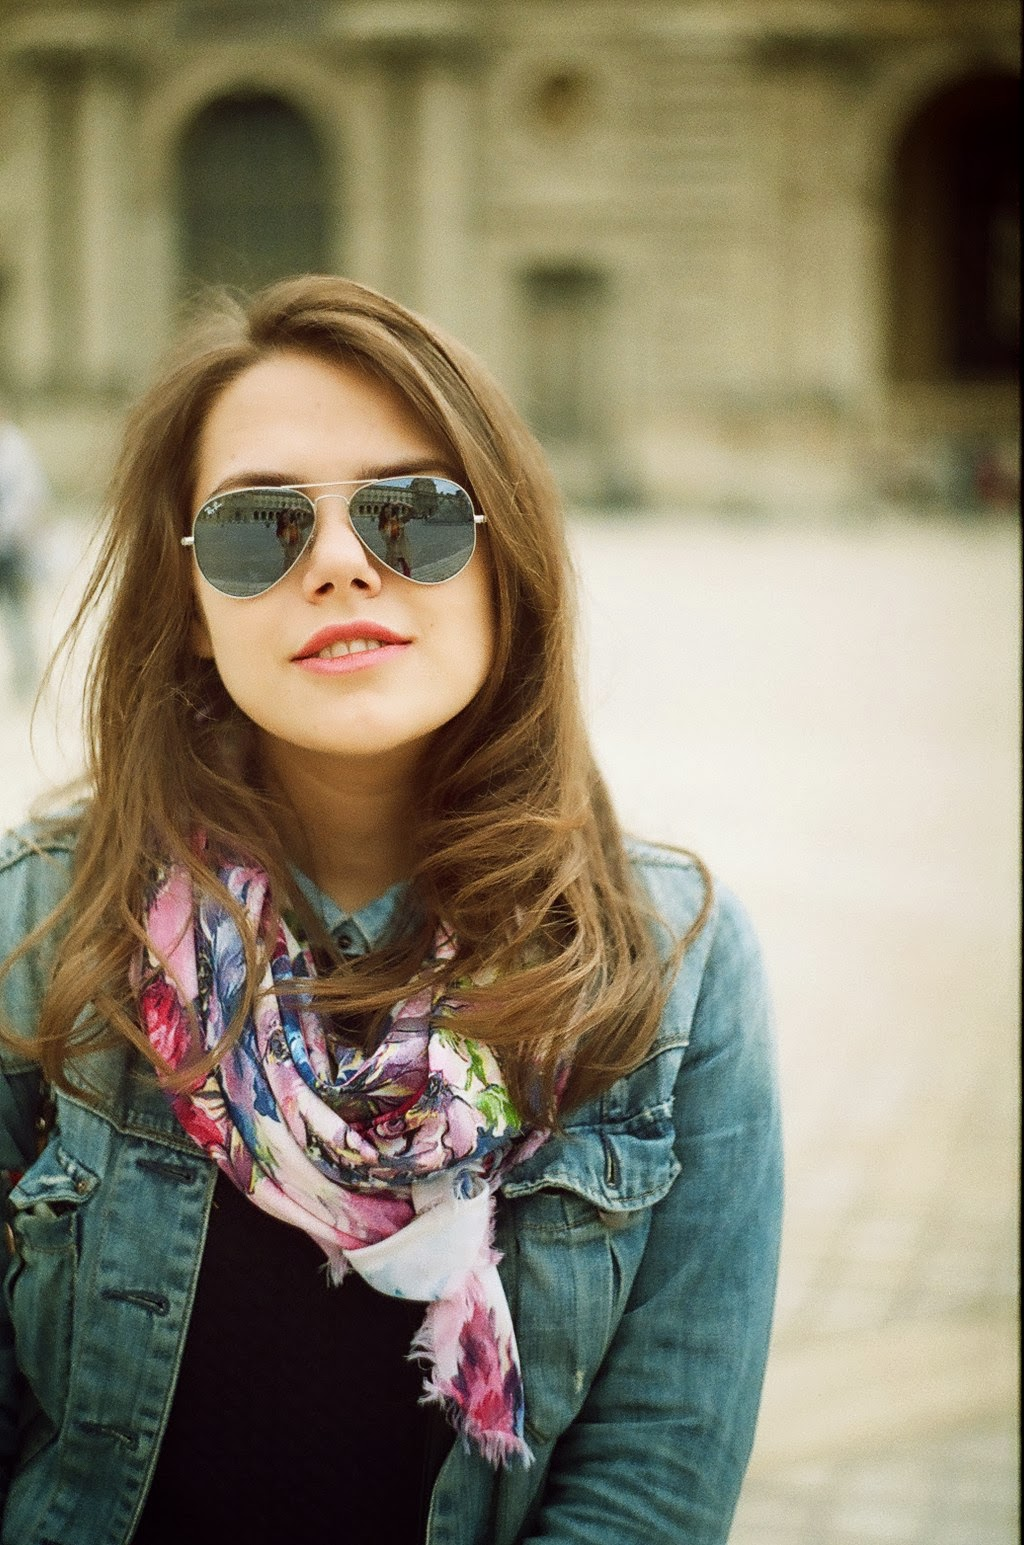 France Girls ~ BEAUTIFUL GIRL WALLPAPERS